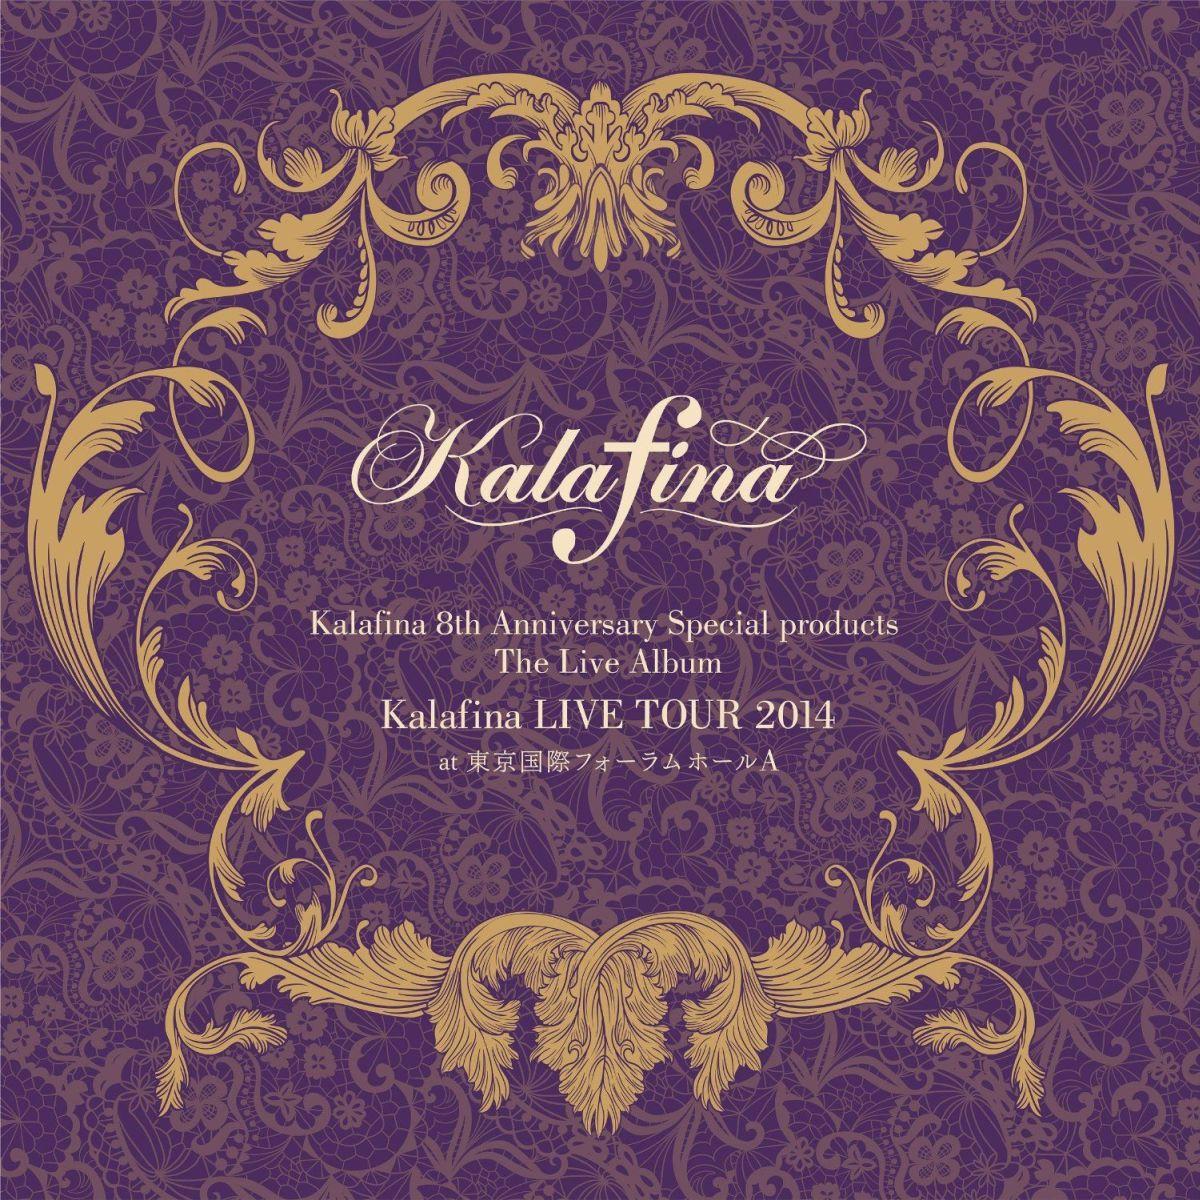 Kalafina 8th Anniversary Special products The Live Album 「Kalafina LIVE TOUR 2014」 at 東京国際フォーラム ホールA画像